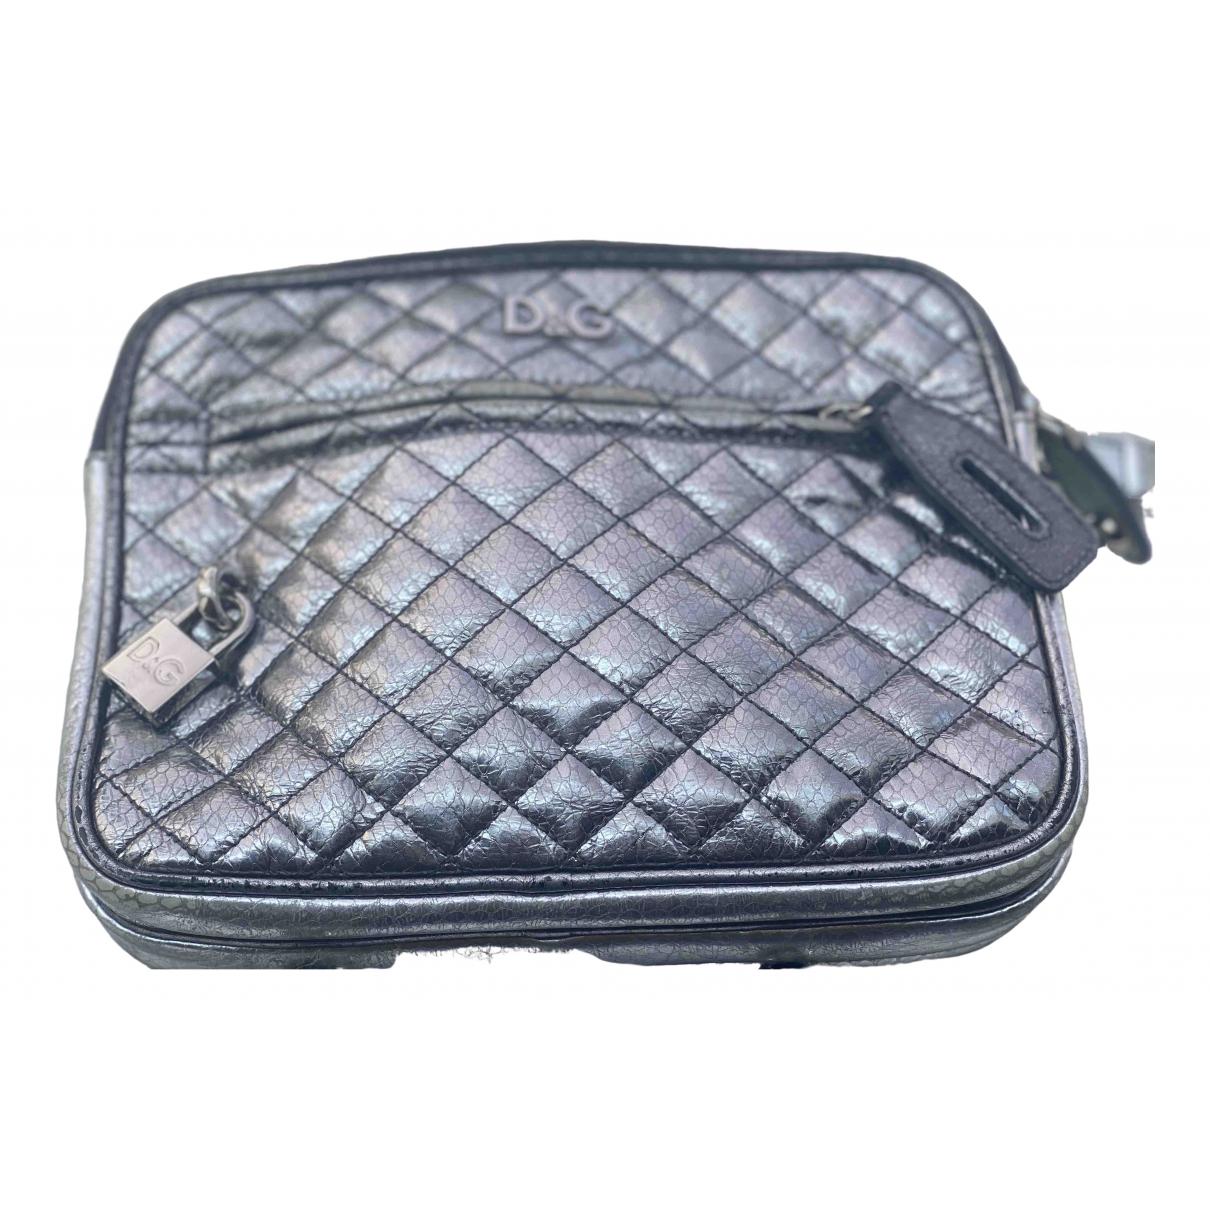 Dolce & Gabbana \N Silver Leather handbag for Women \N